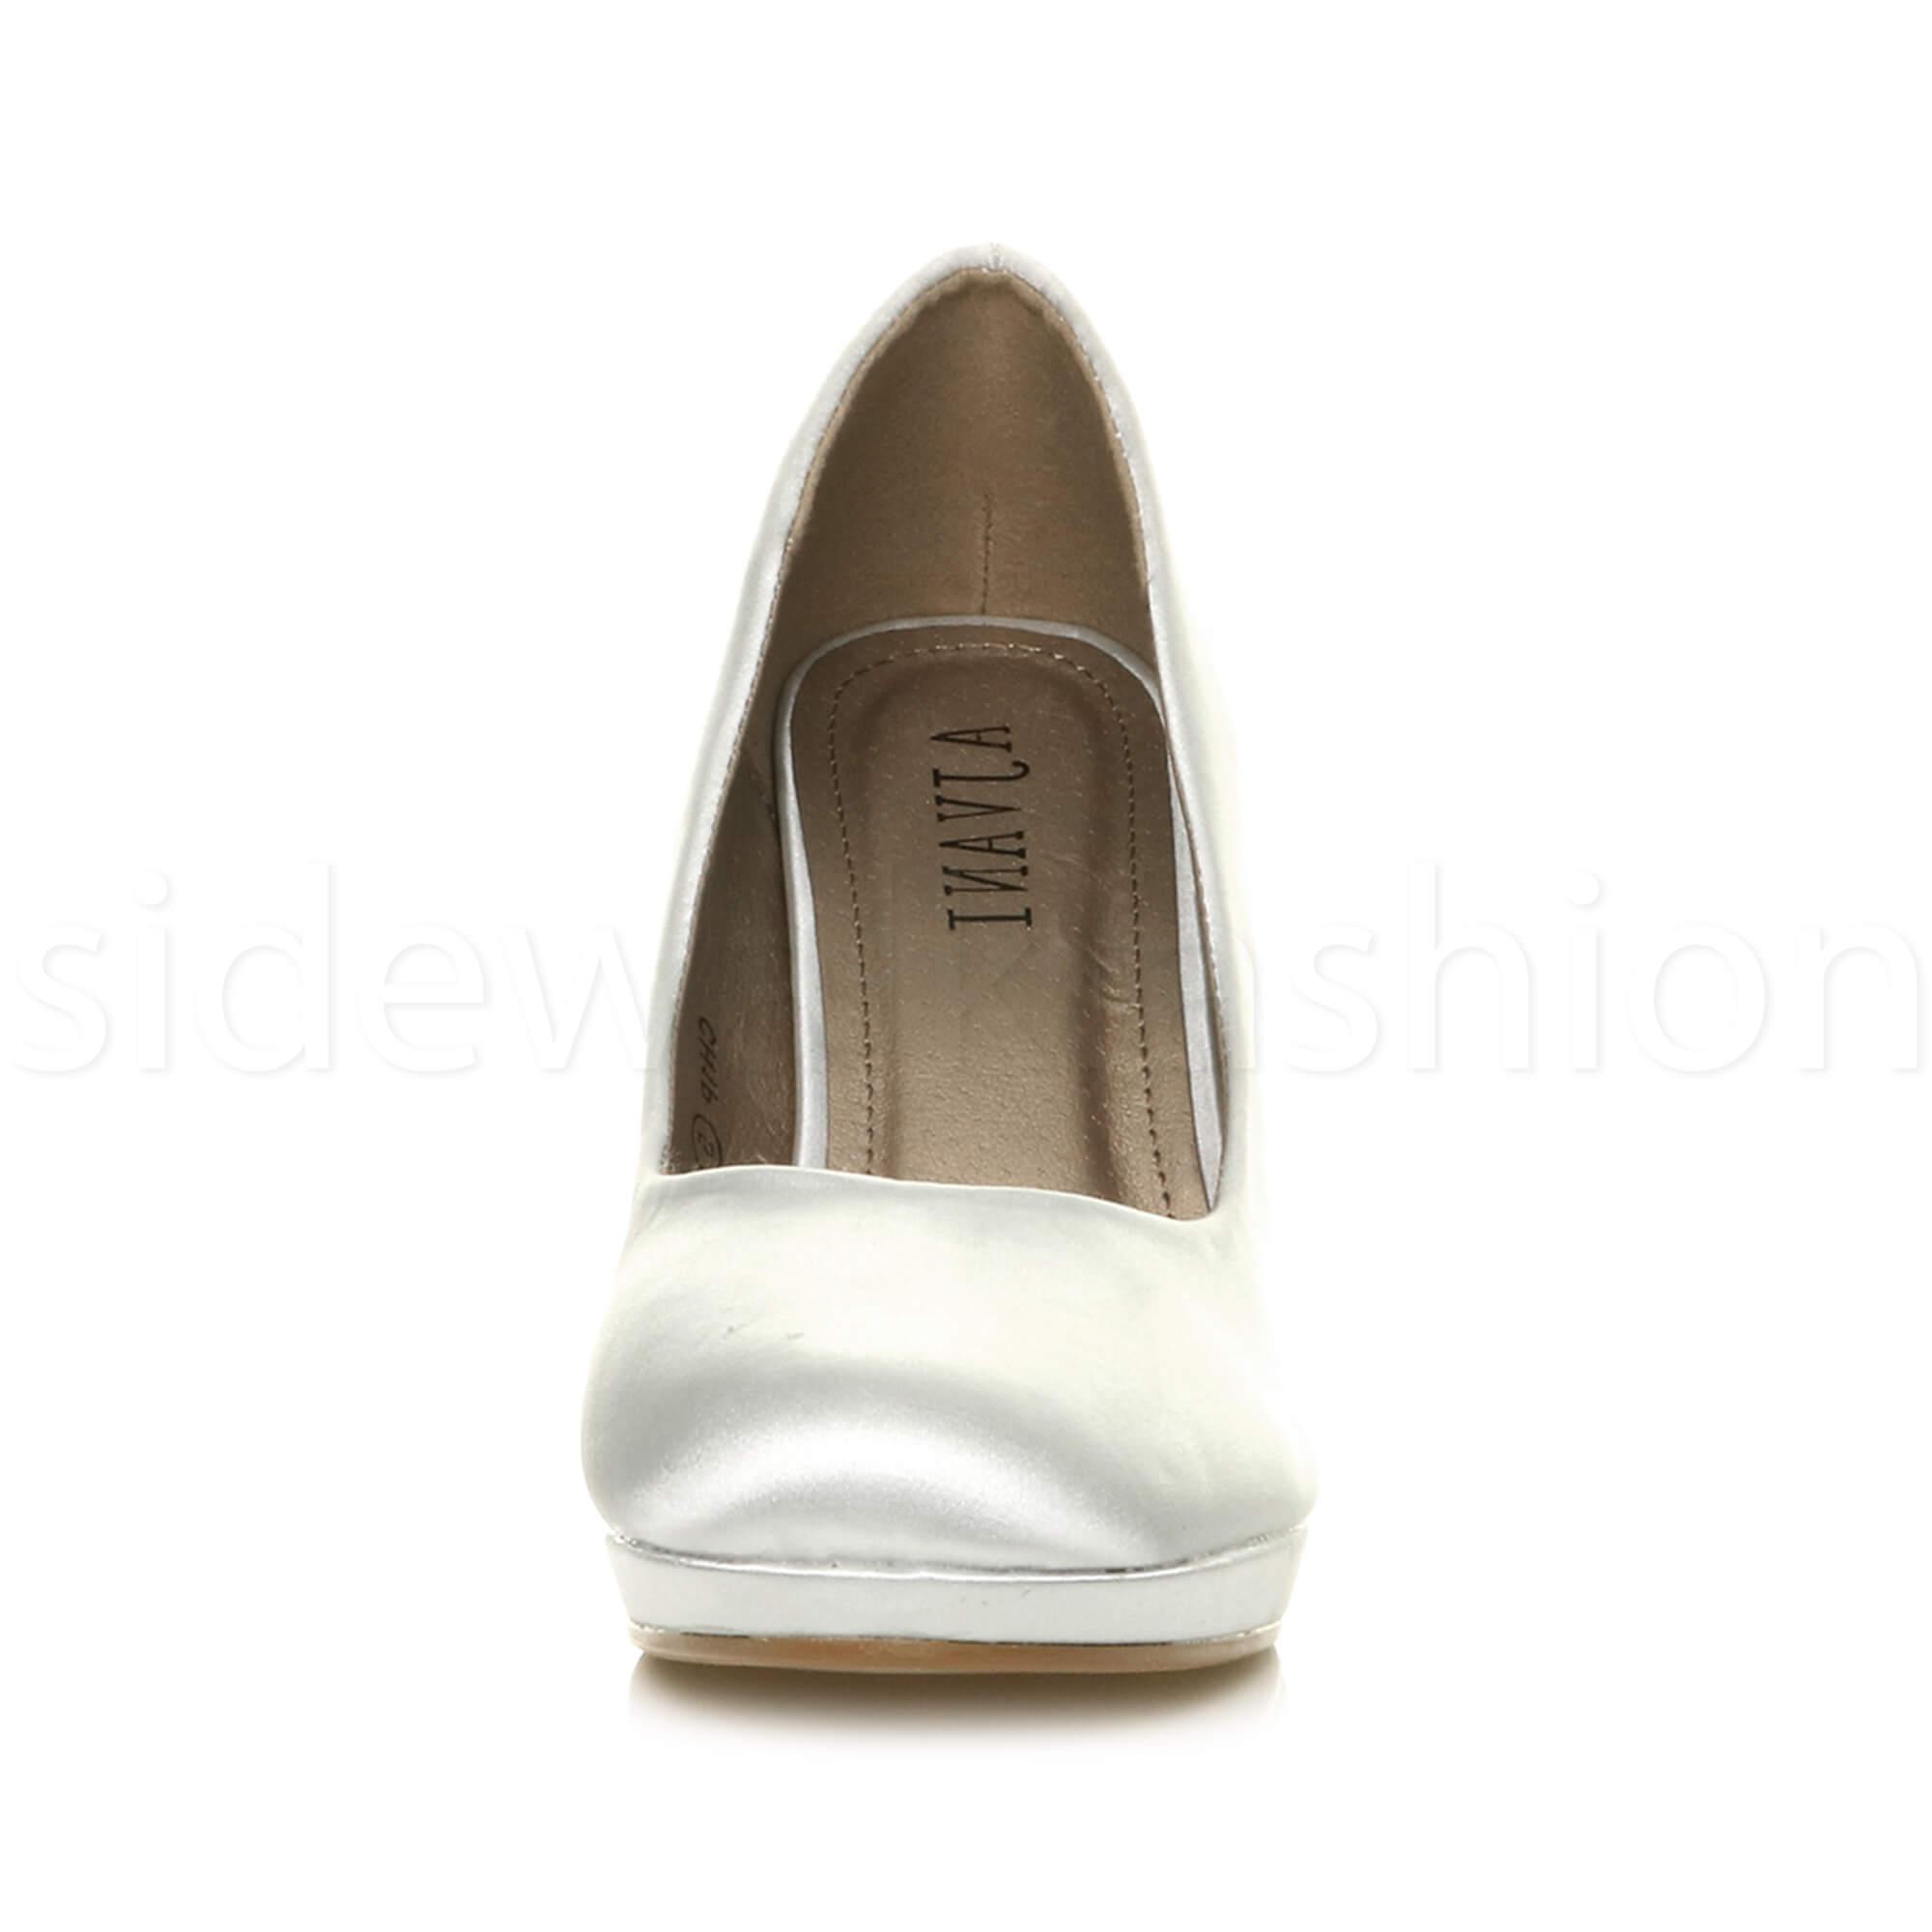 Womens-ladies-high-mid-heel-platform-wedding-evening-bridesmaid-court-shoes-size thumbnail 188